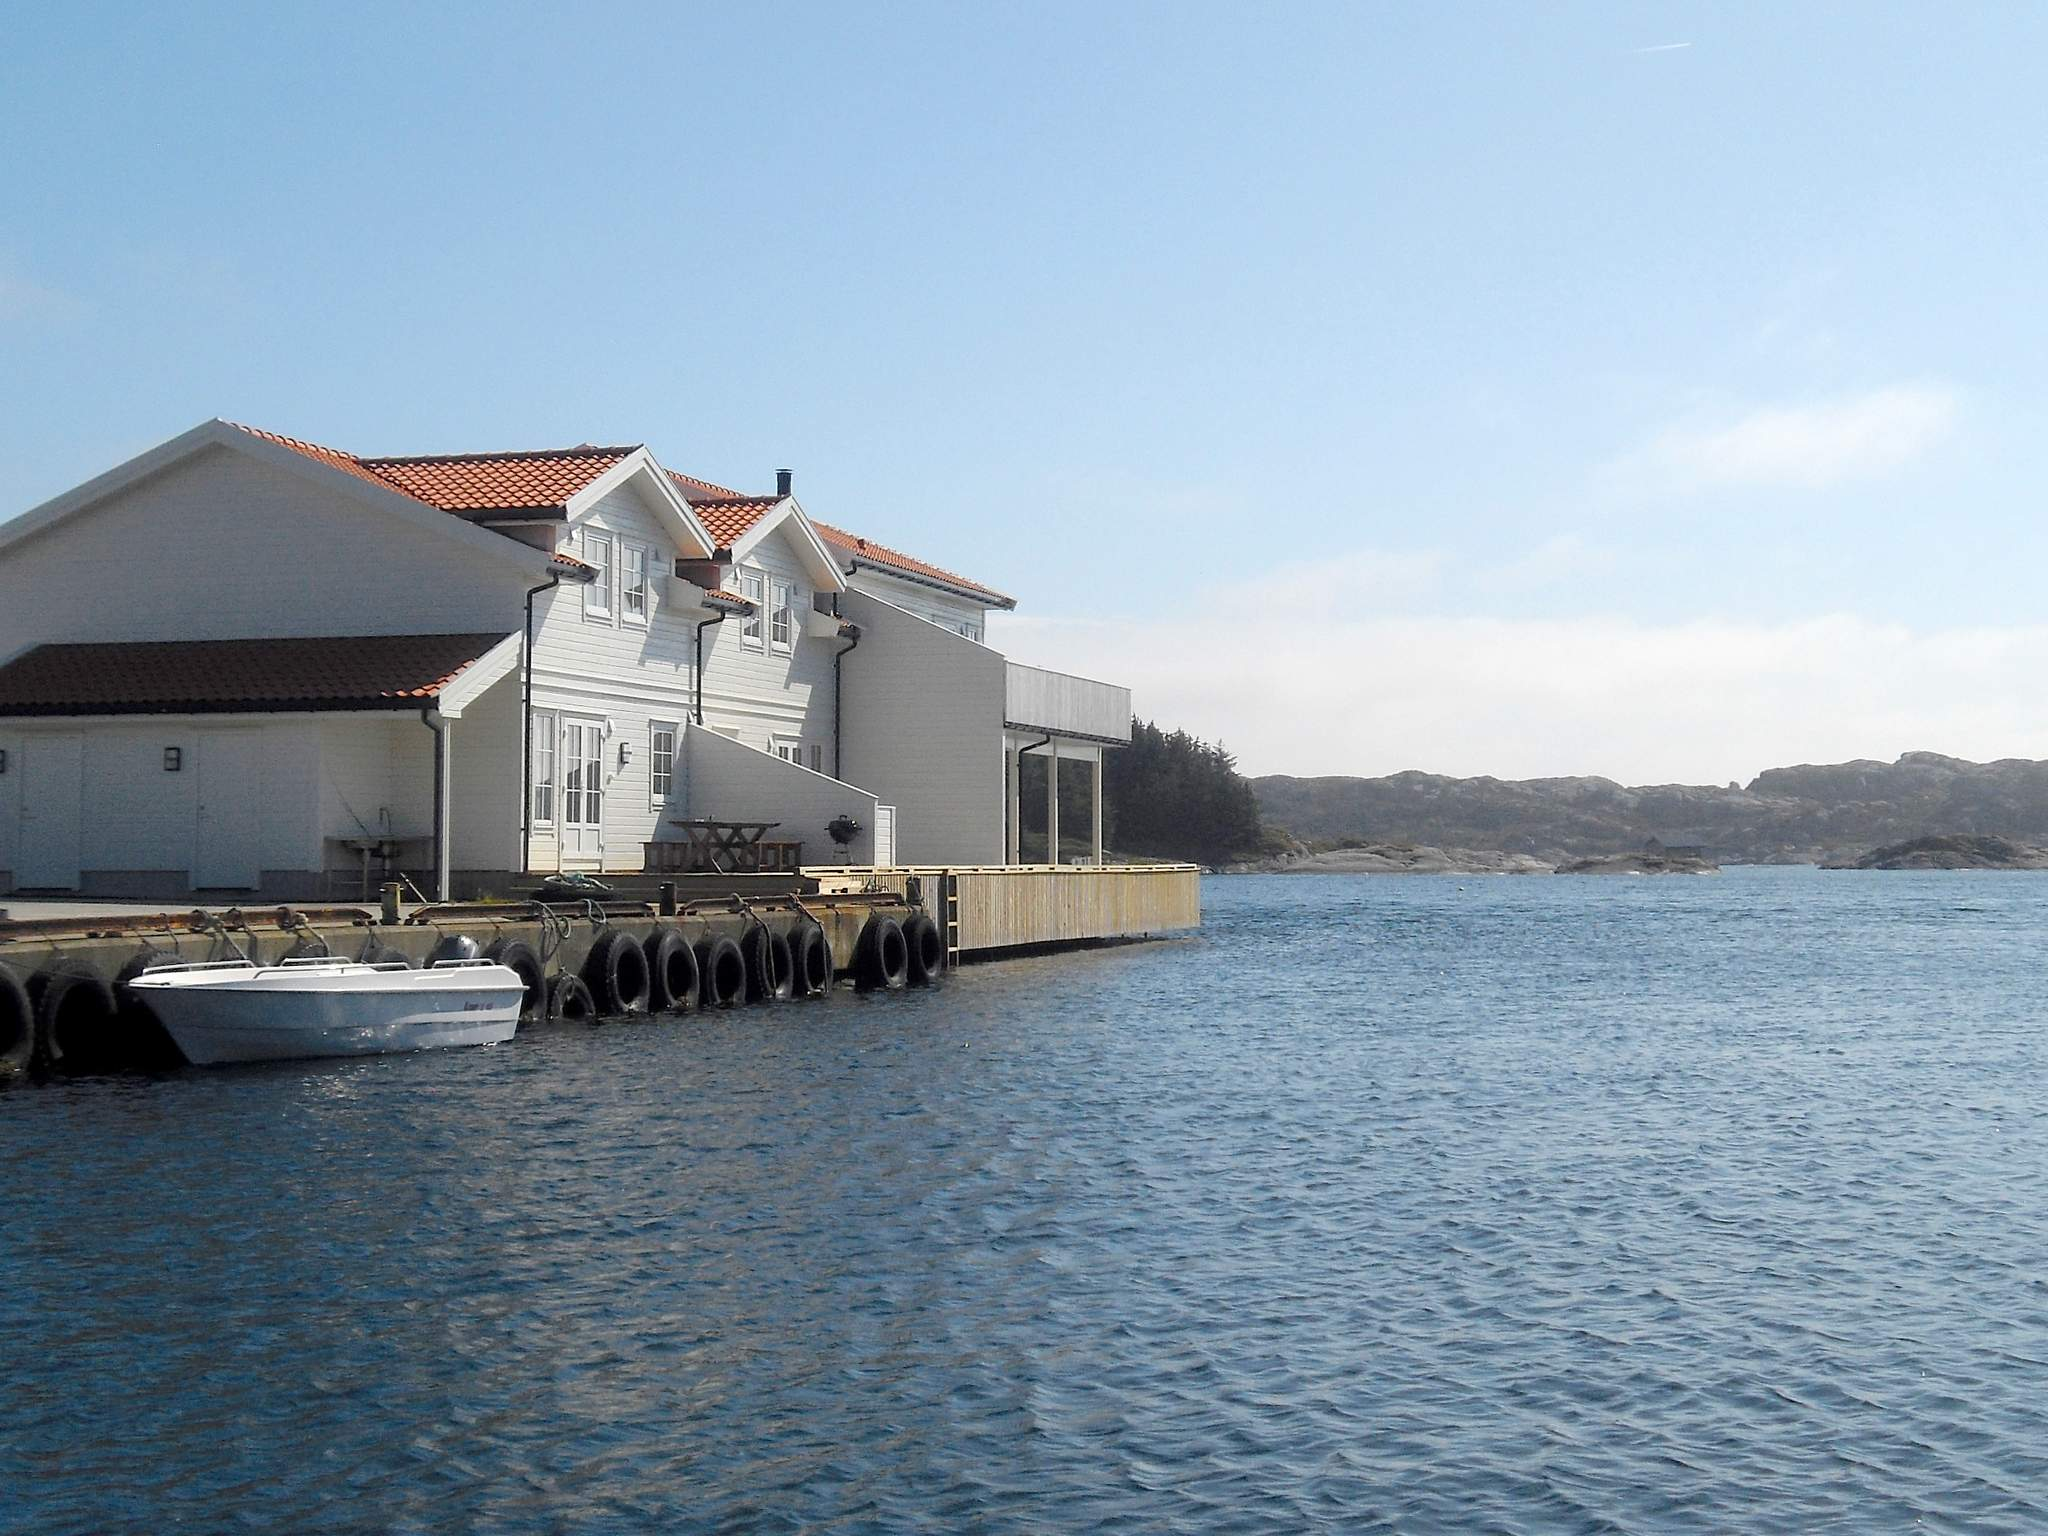 Ferienhaus Mølstrevåg (365129), Sveio, Hordaland - Hardangerfjord, Westnorwegen, Norwegen, Bild 16